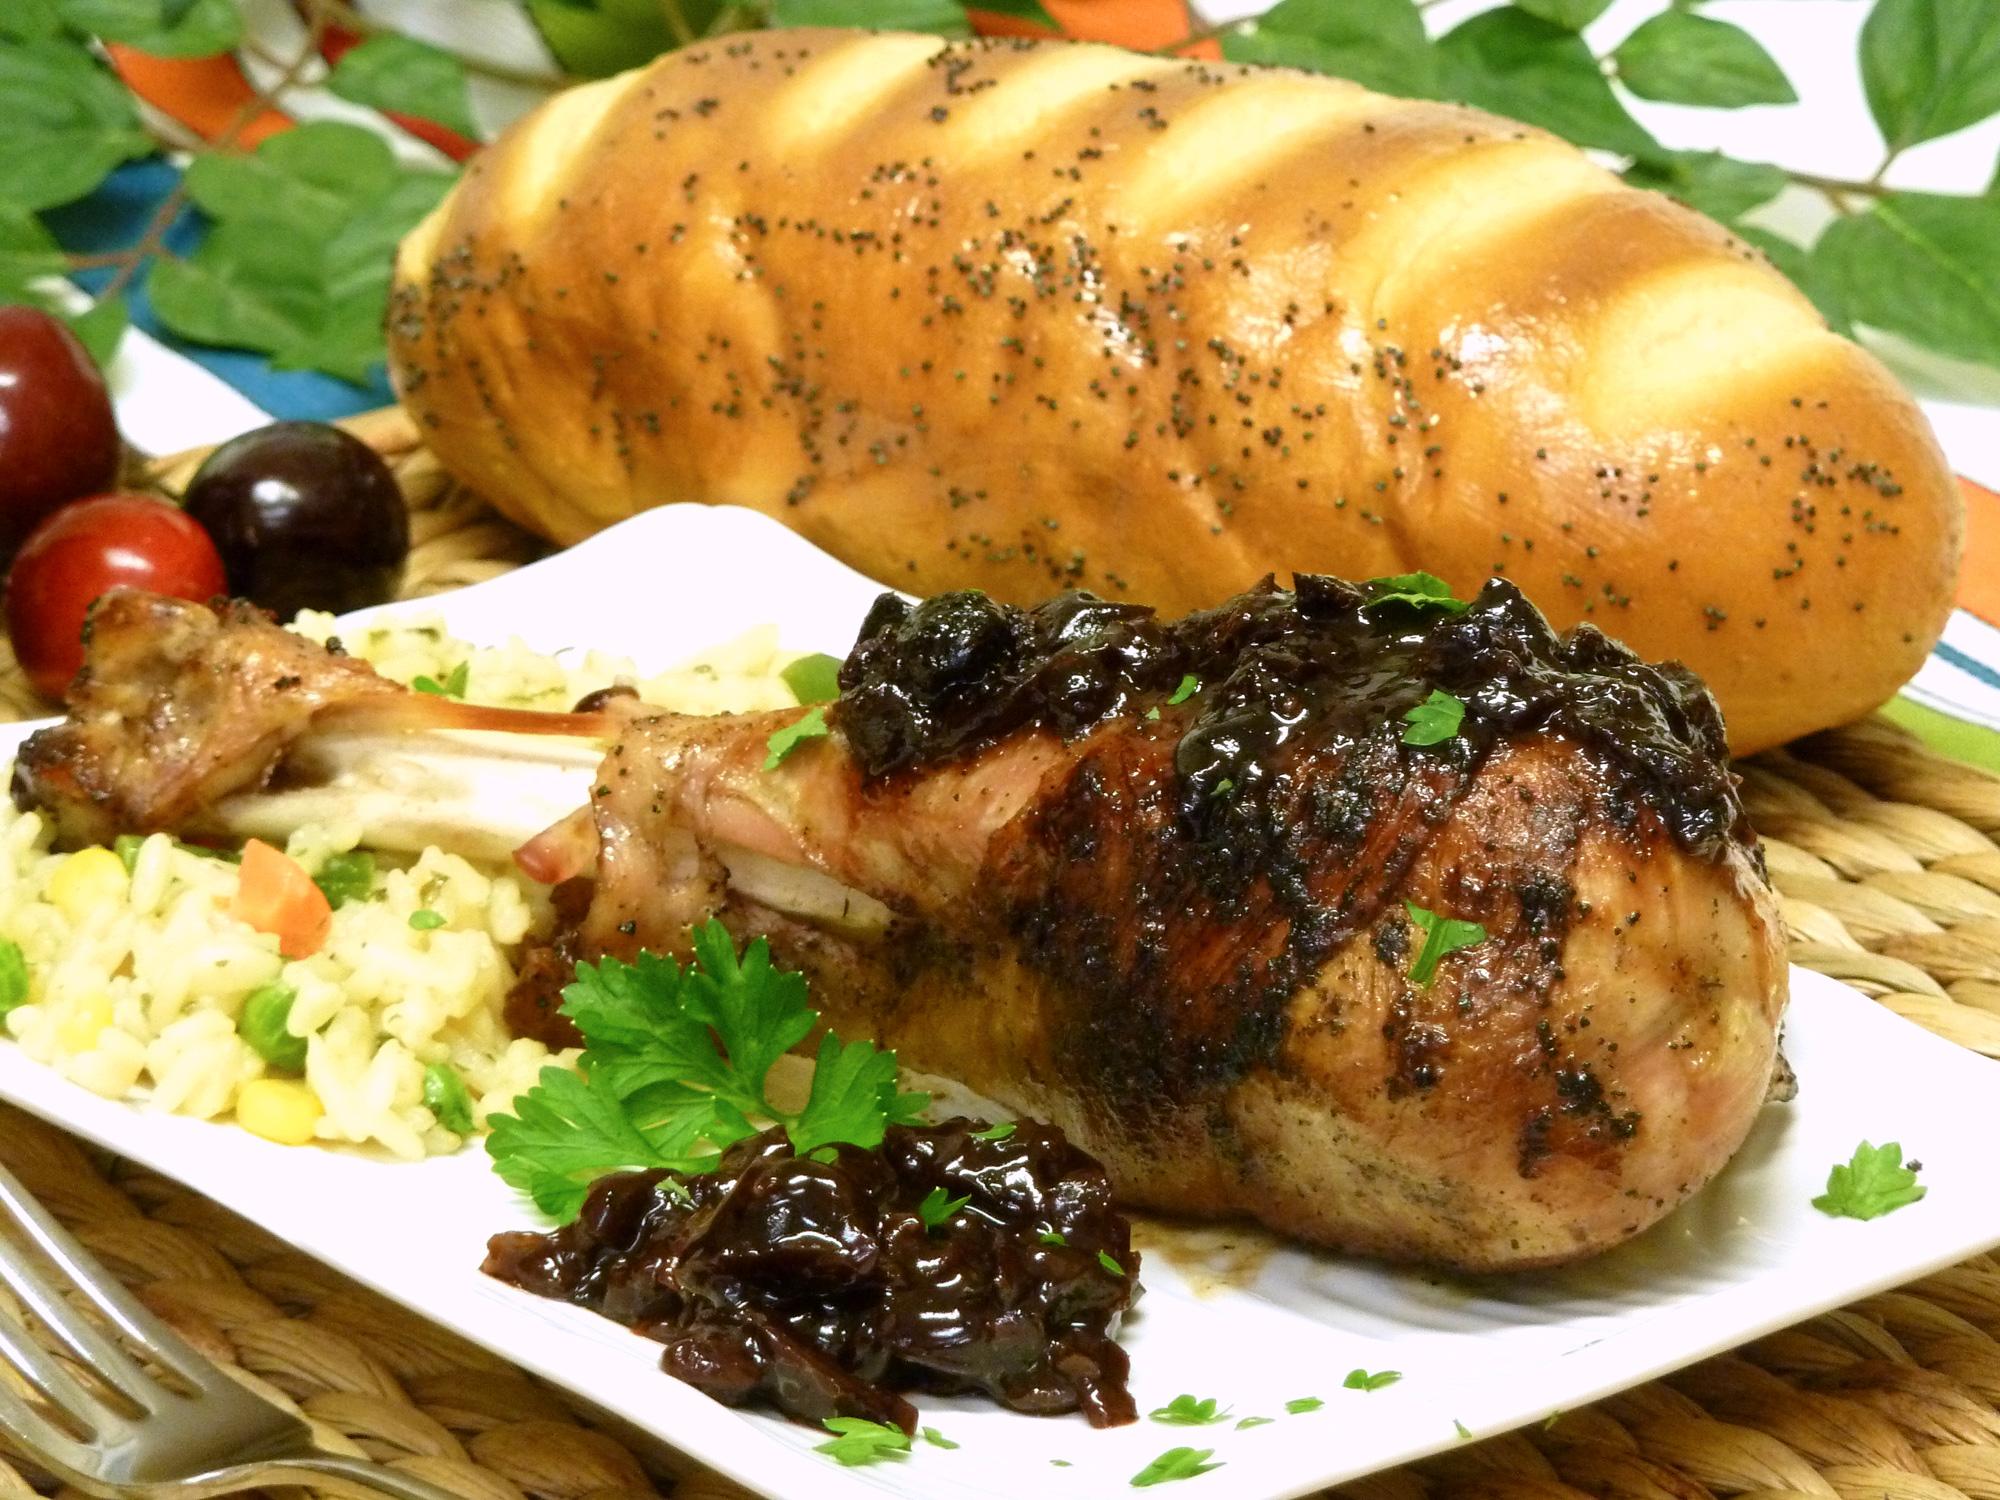 Succulent turkey legs coated with savory cherry glaze.